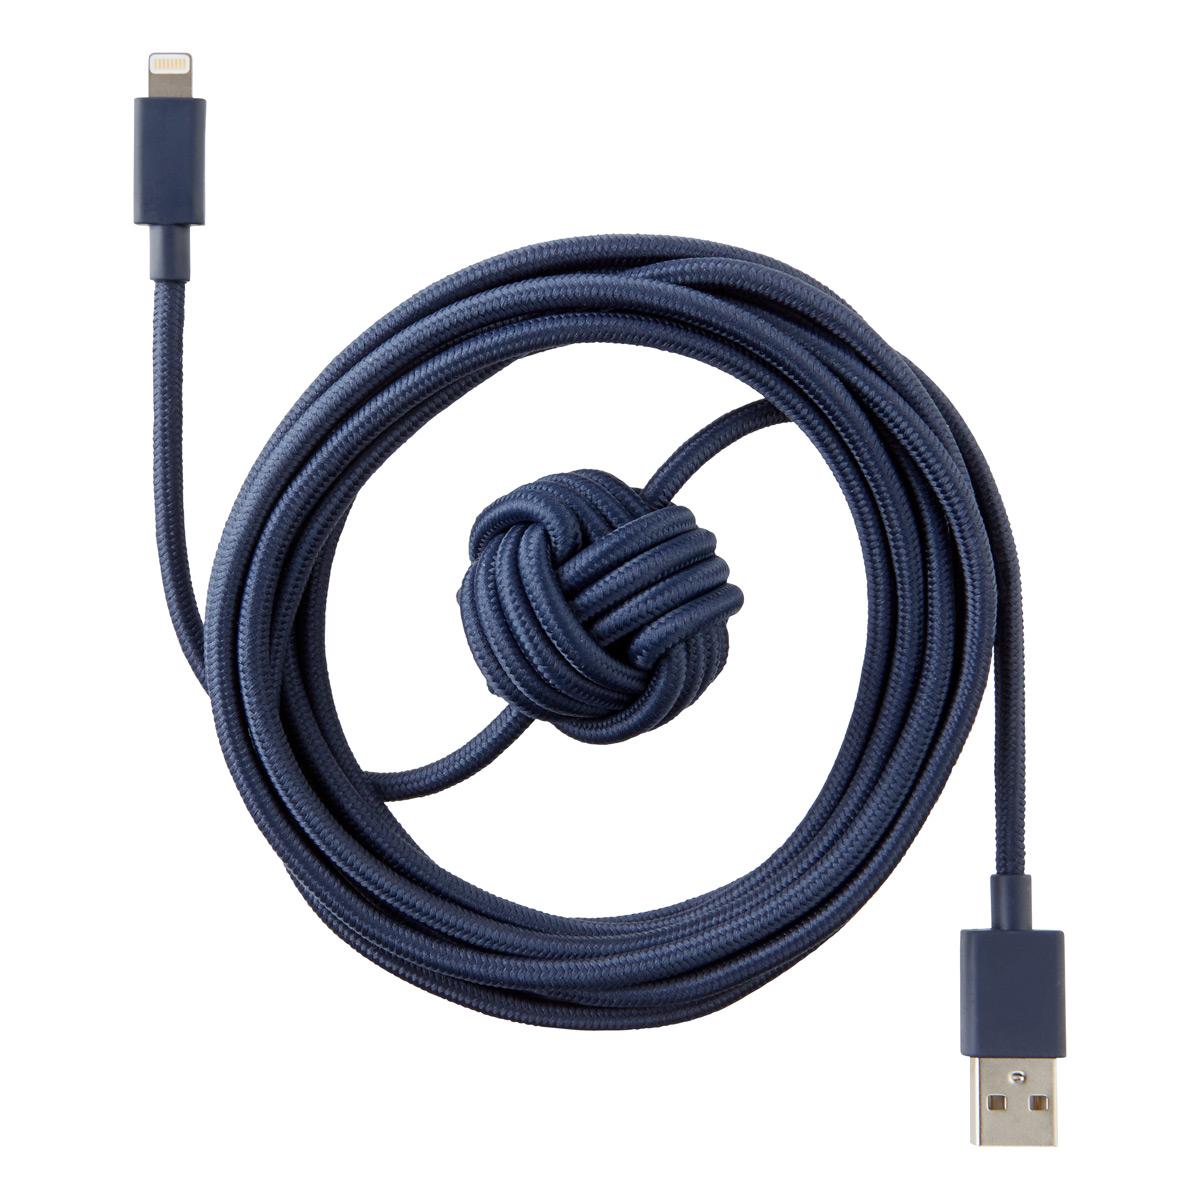 Lightning USB Night Cable